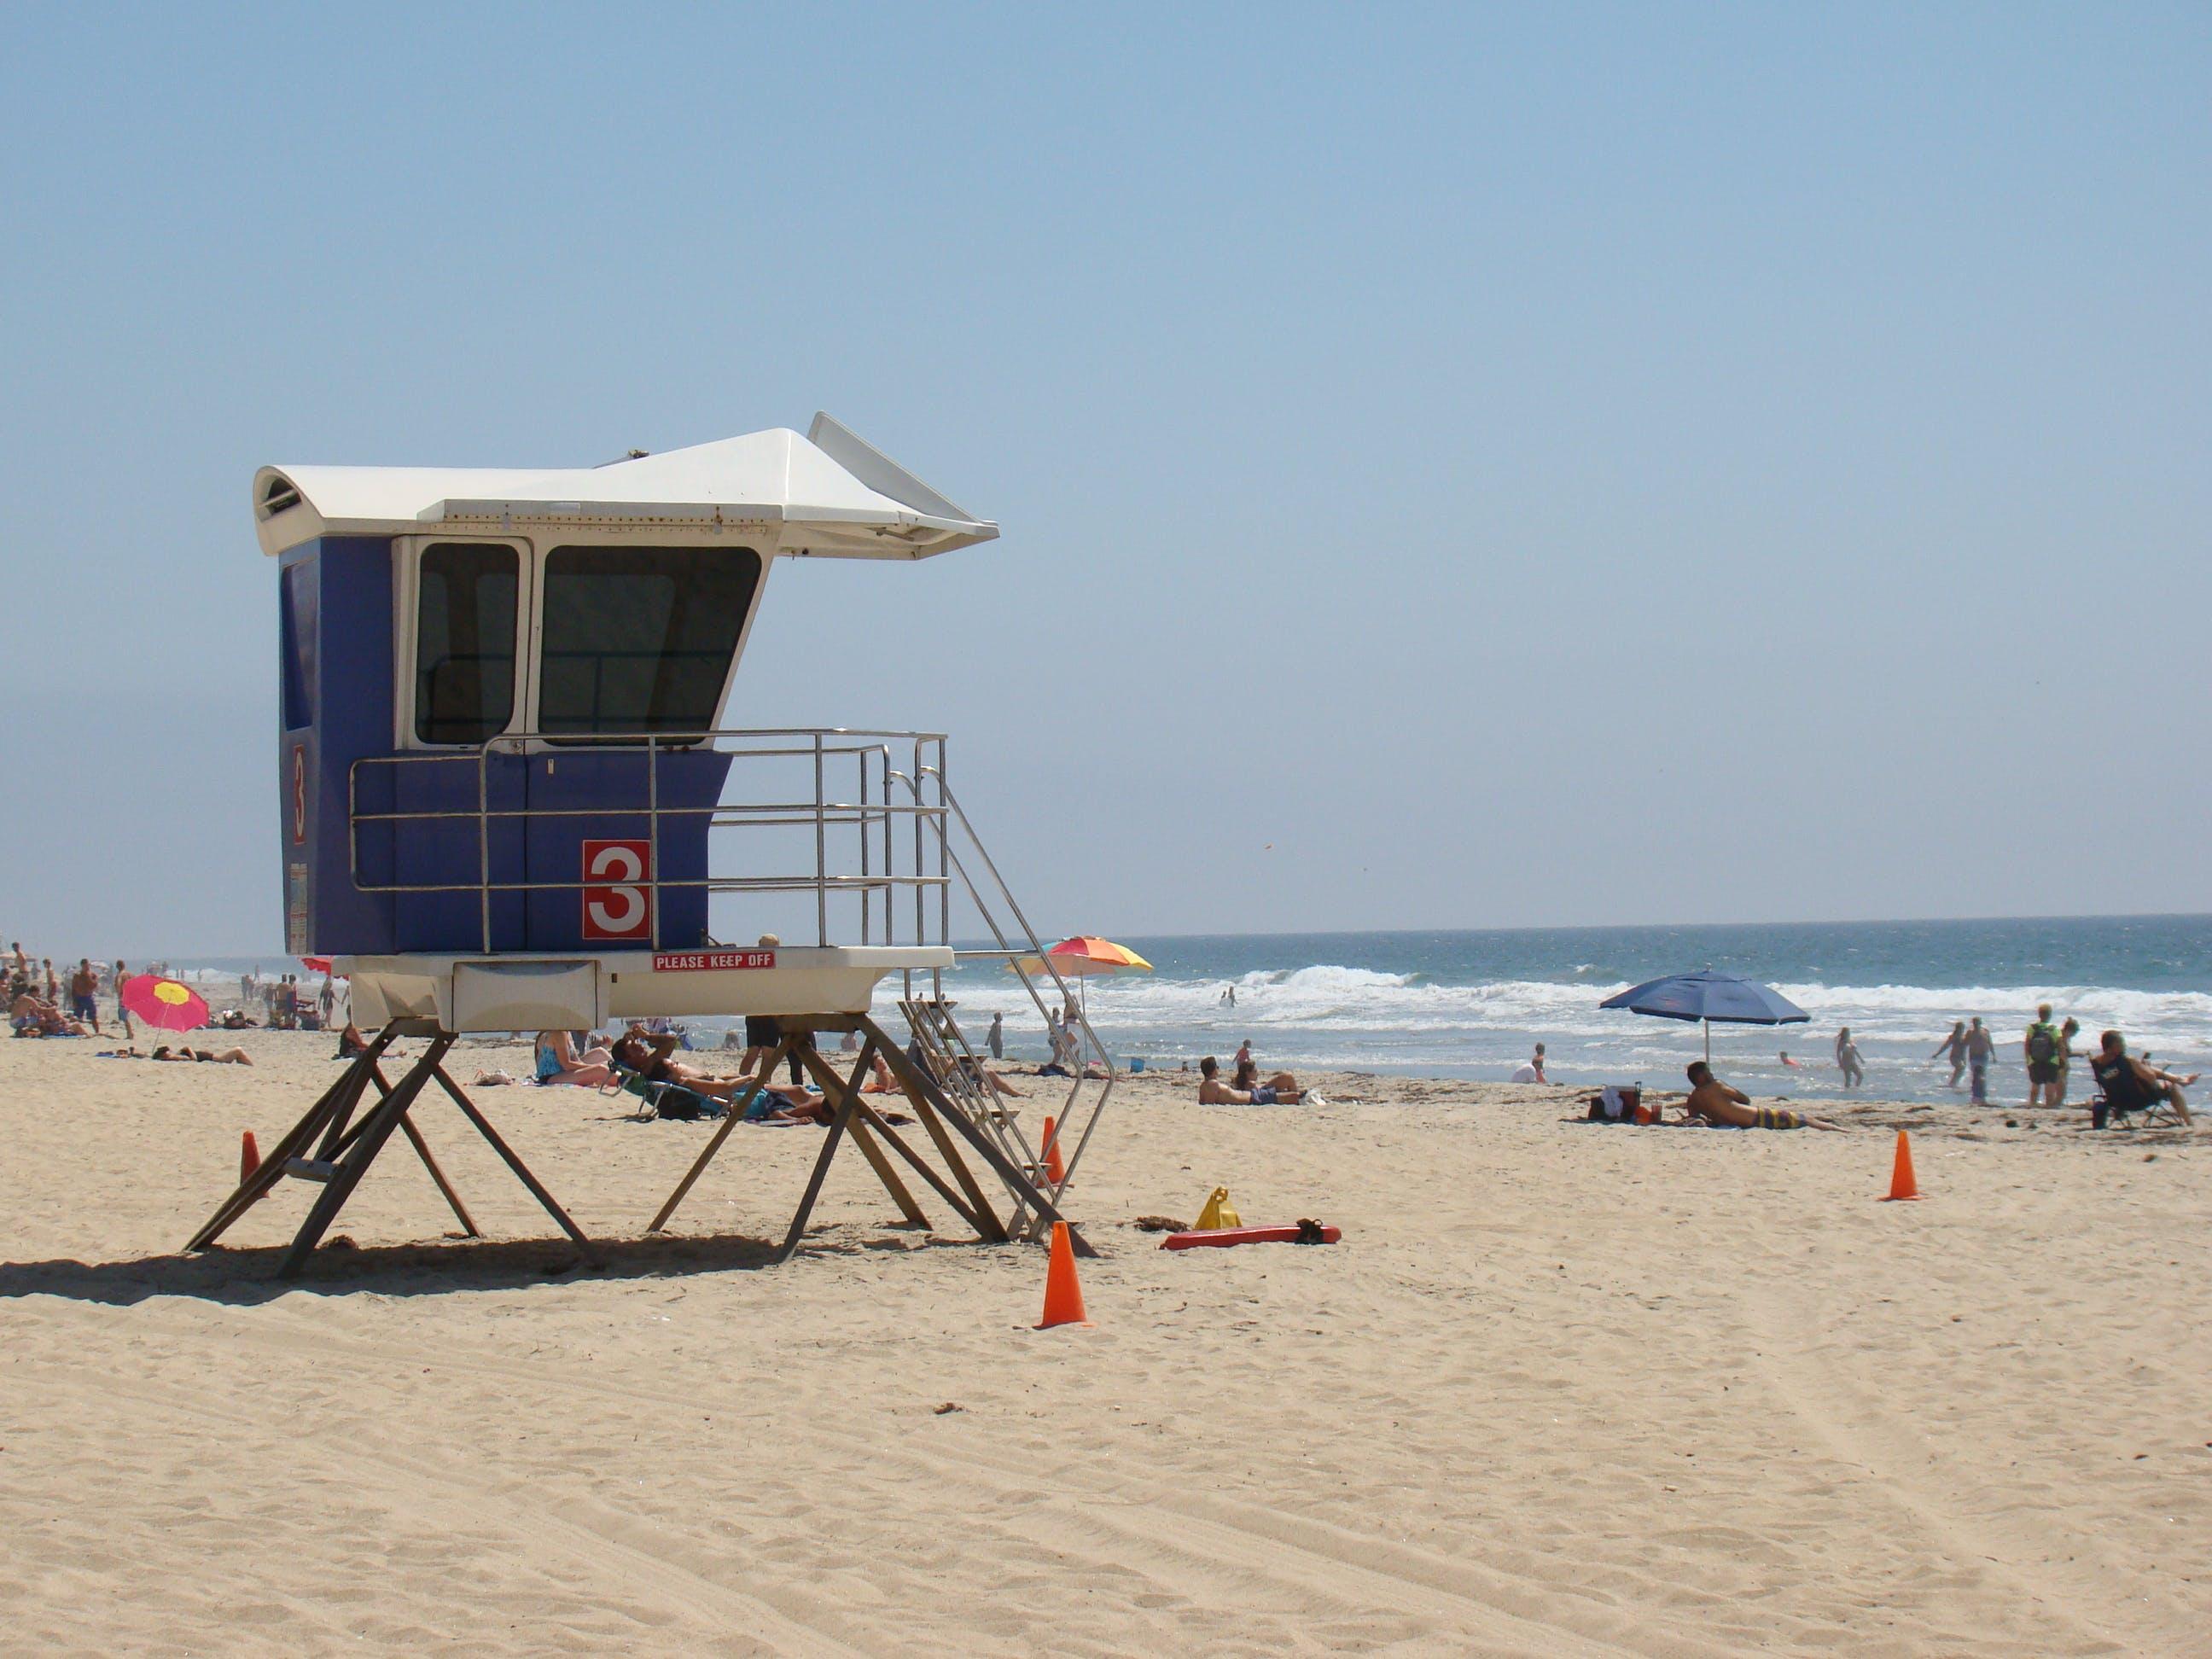 beach, clear sky, cones